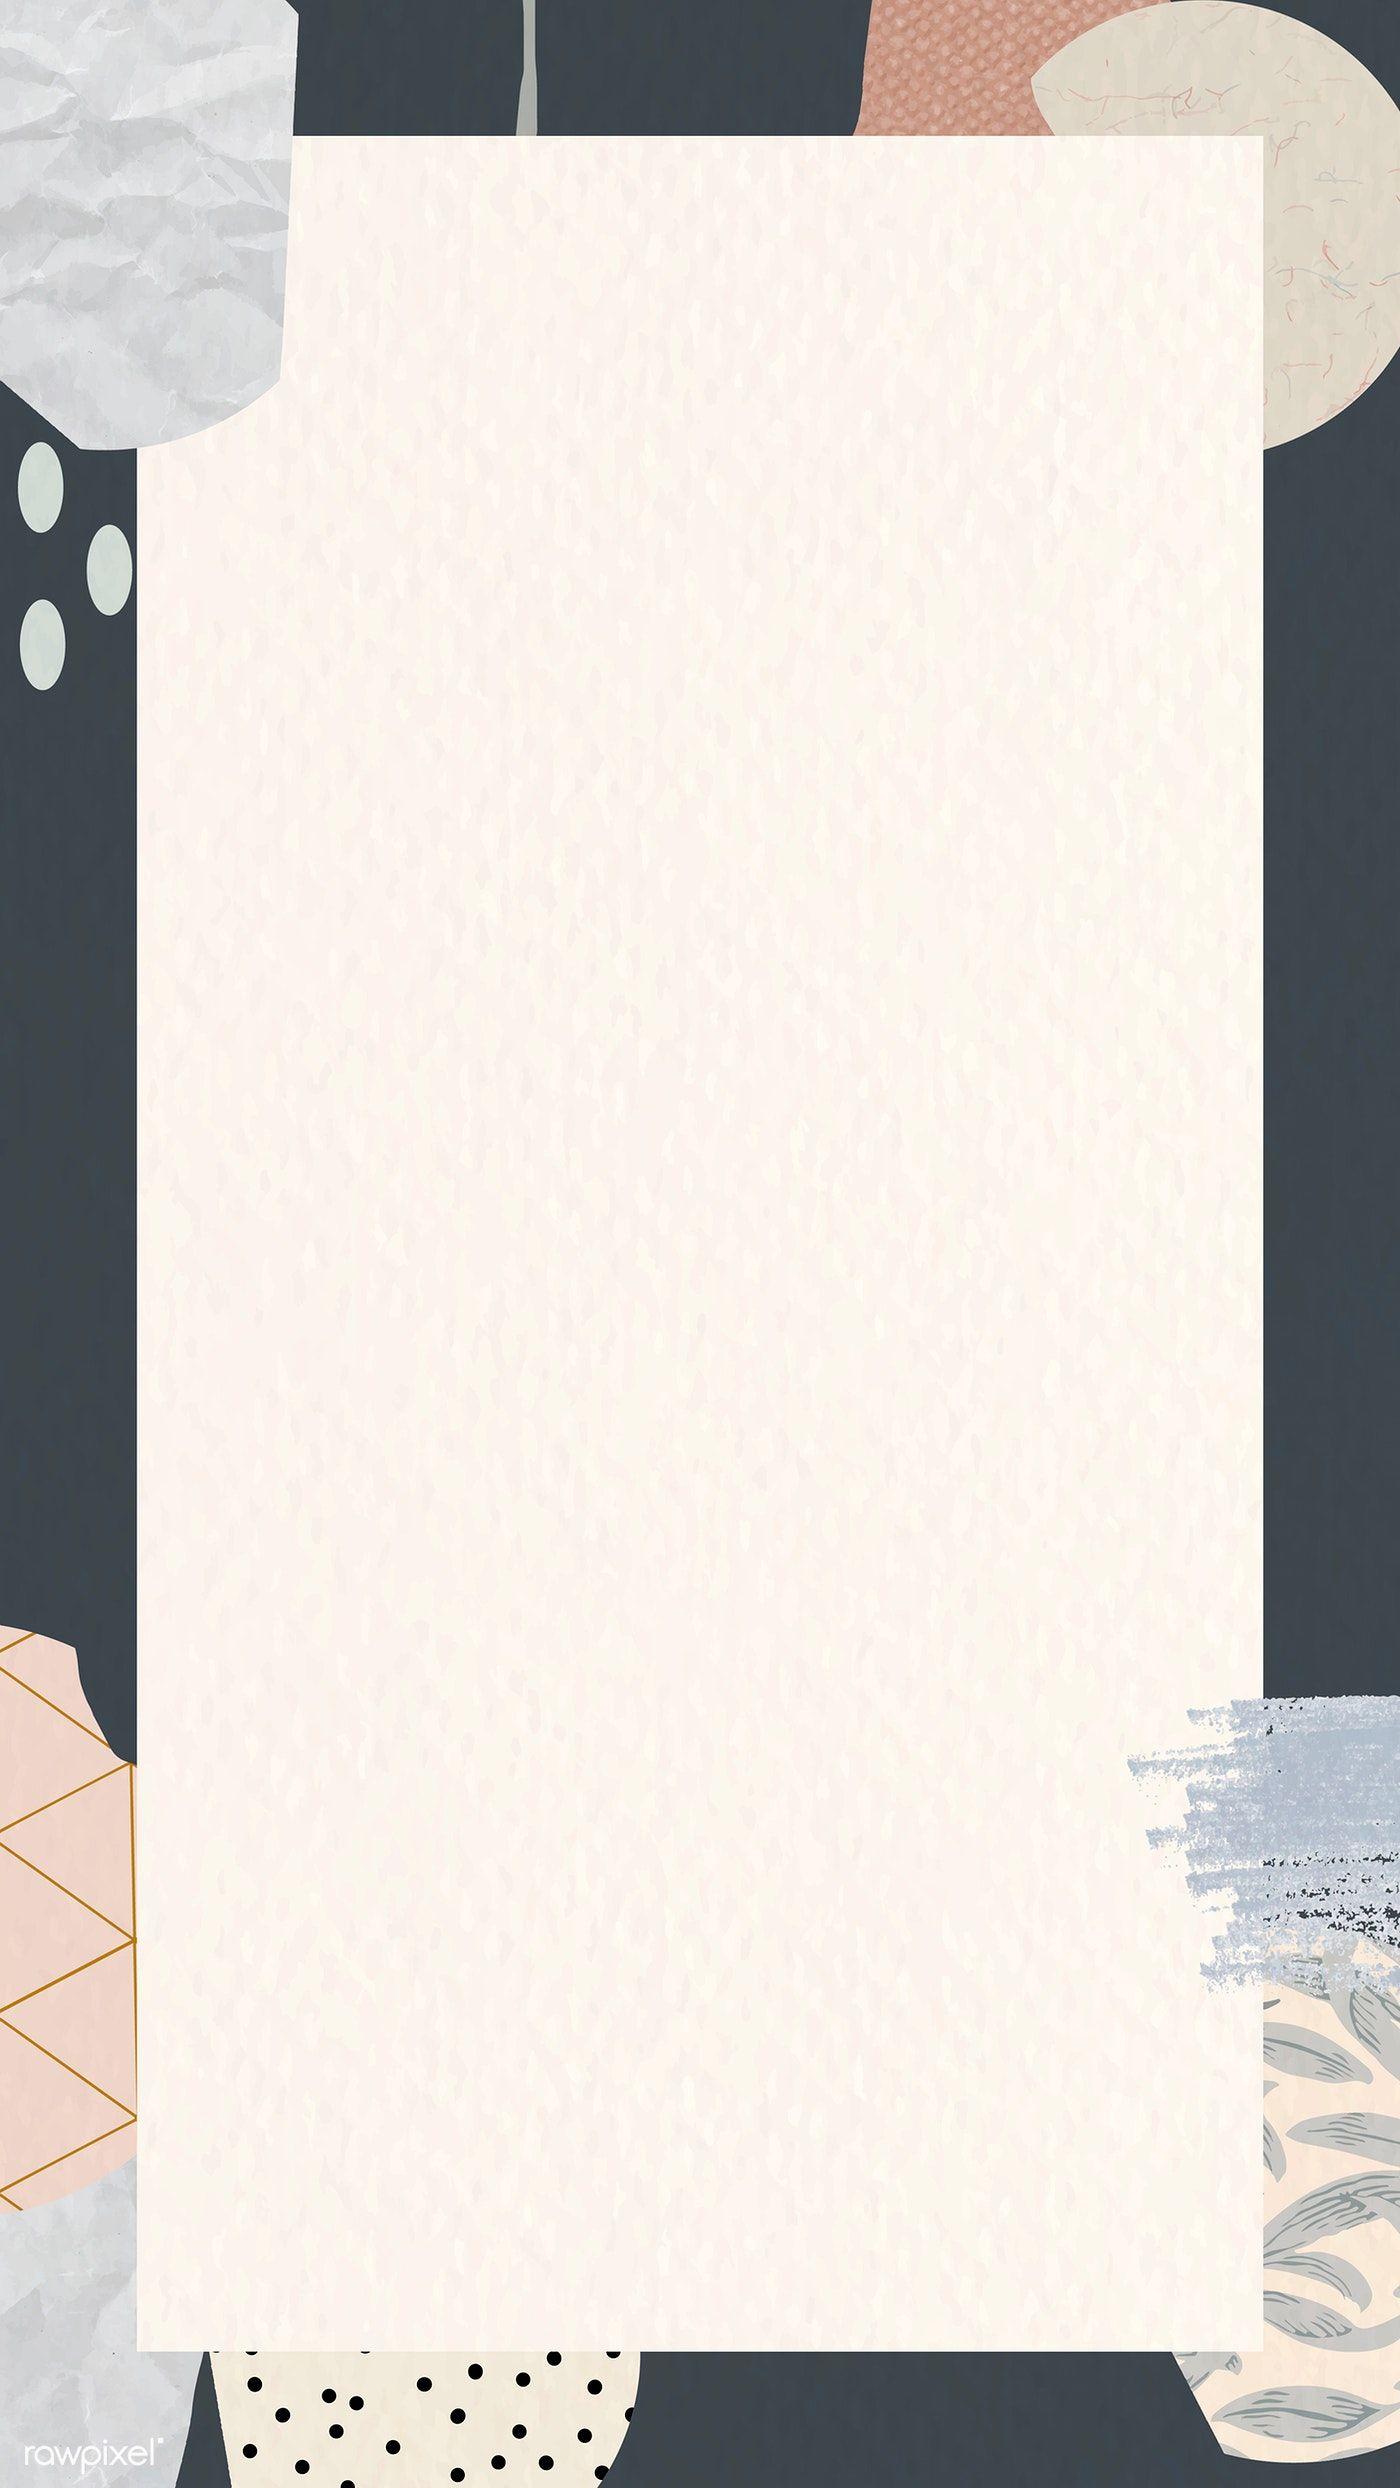 Download premium vector of Terrazzo patterned mobile phone wallpaper